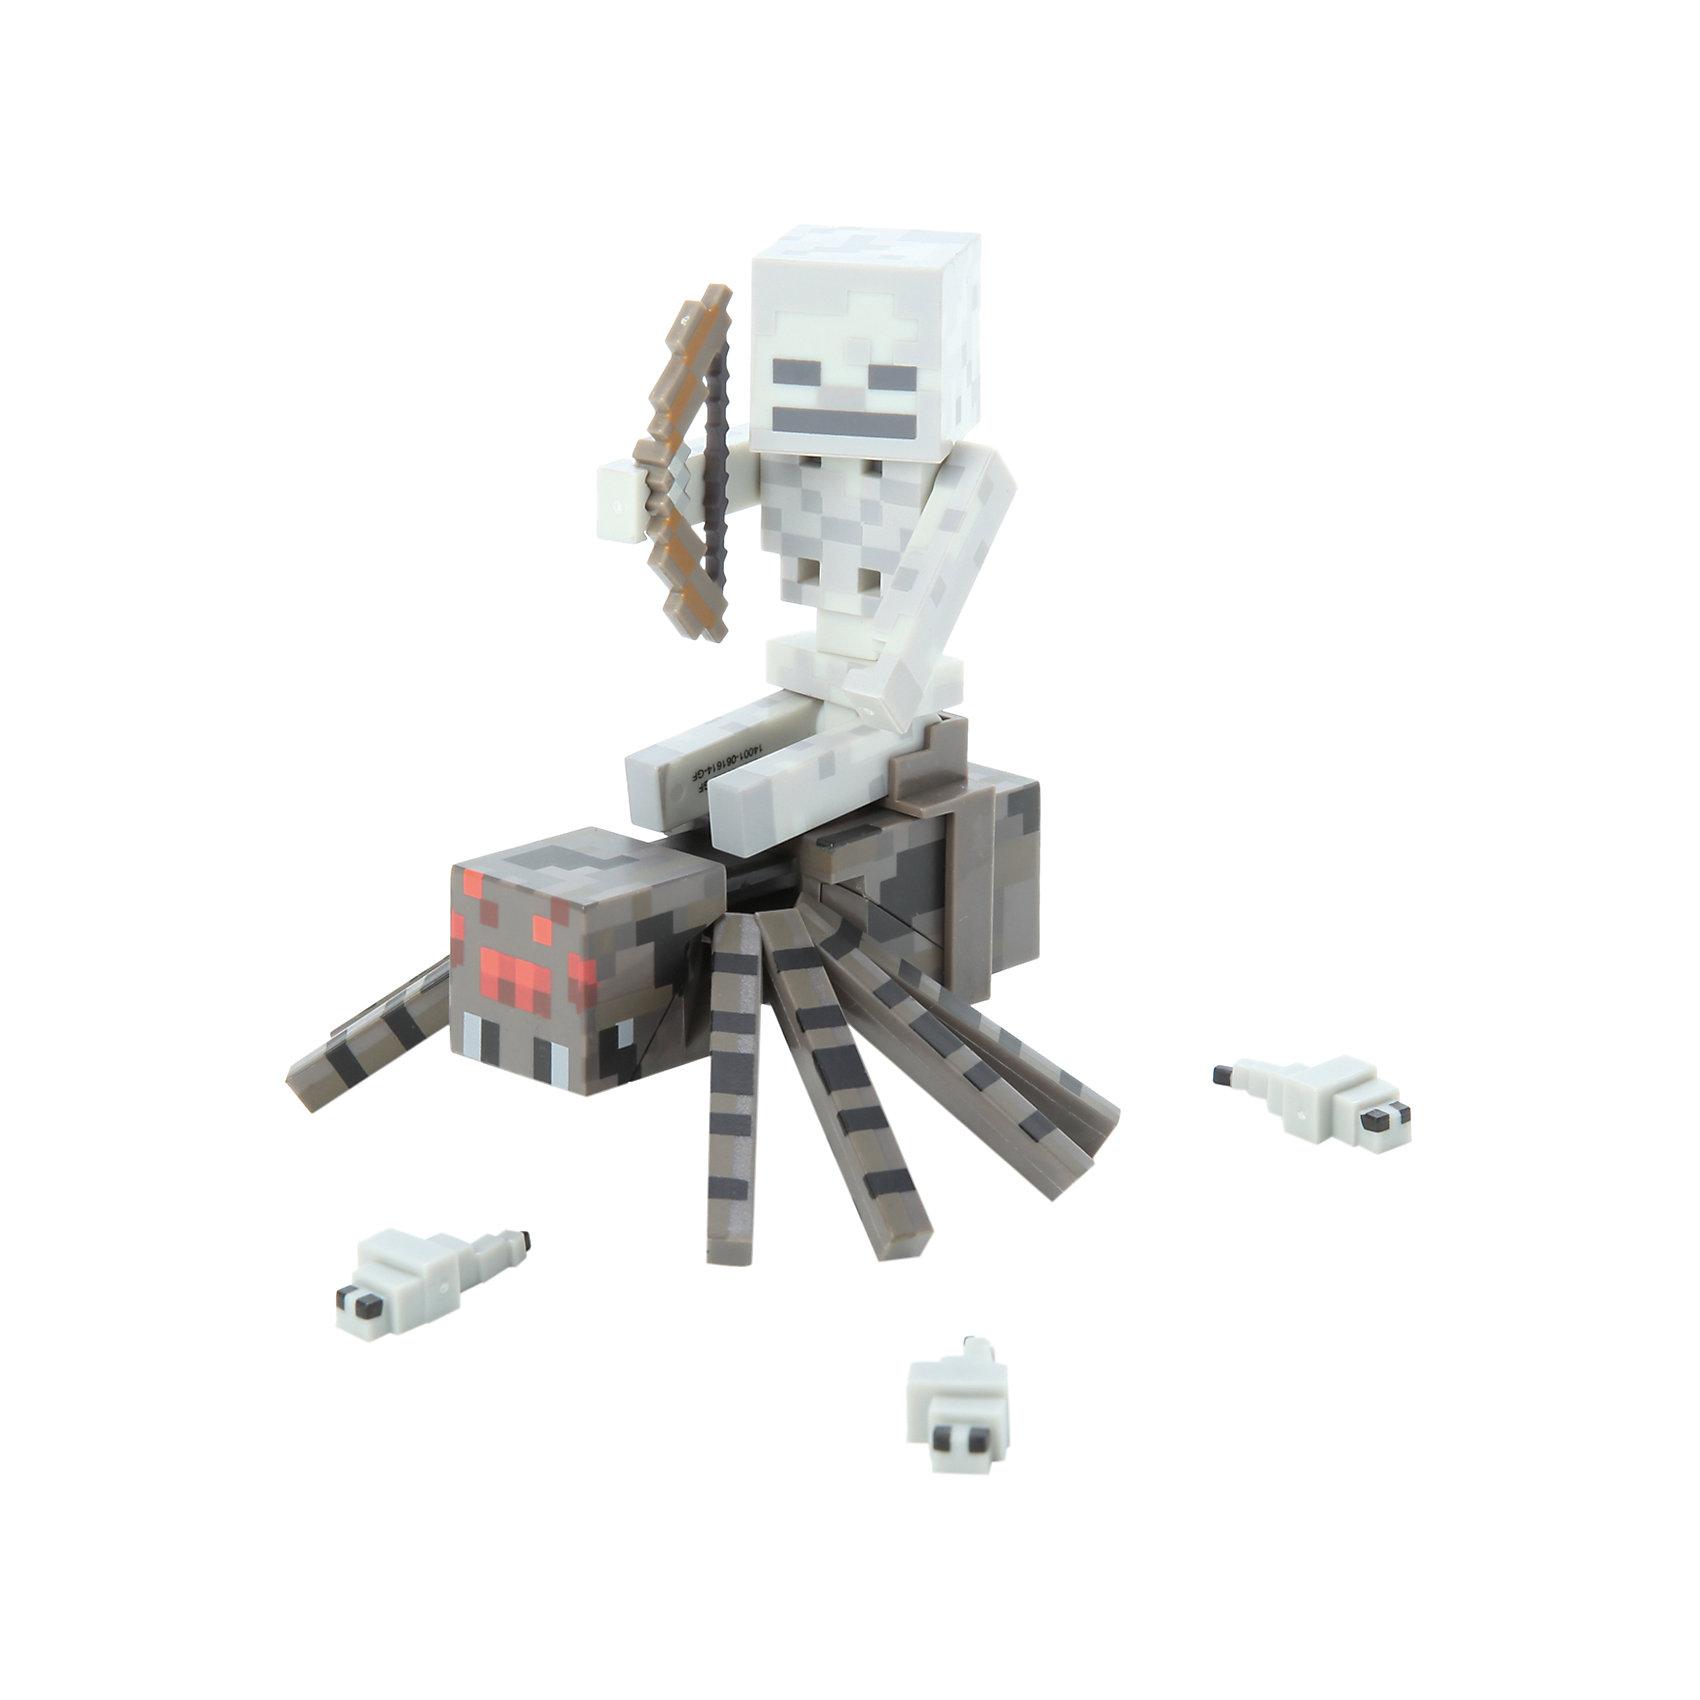 Jazwares Фигурка Скелет с Пауком, 8 см, Minecraft mattel games фигурка персонажей minecraft